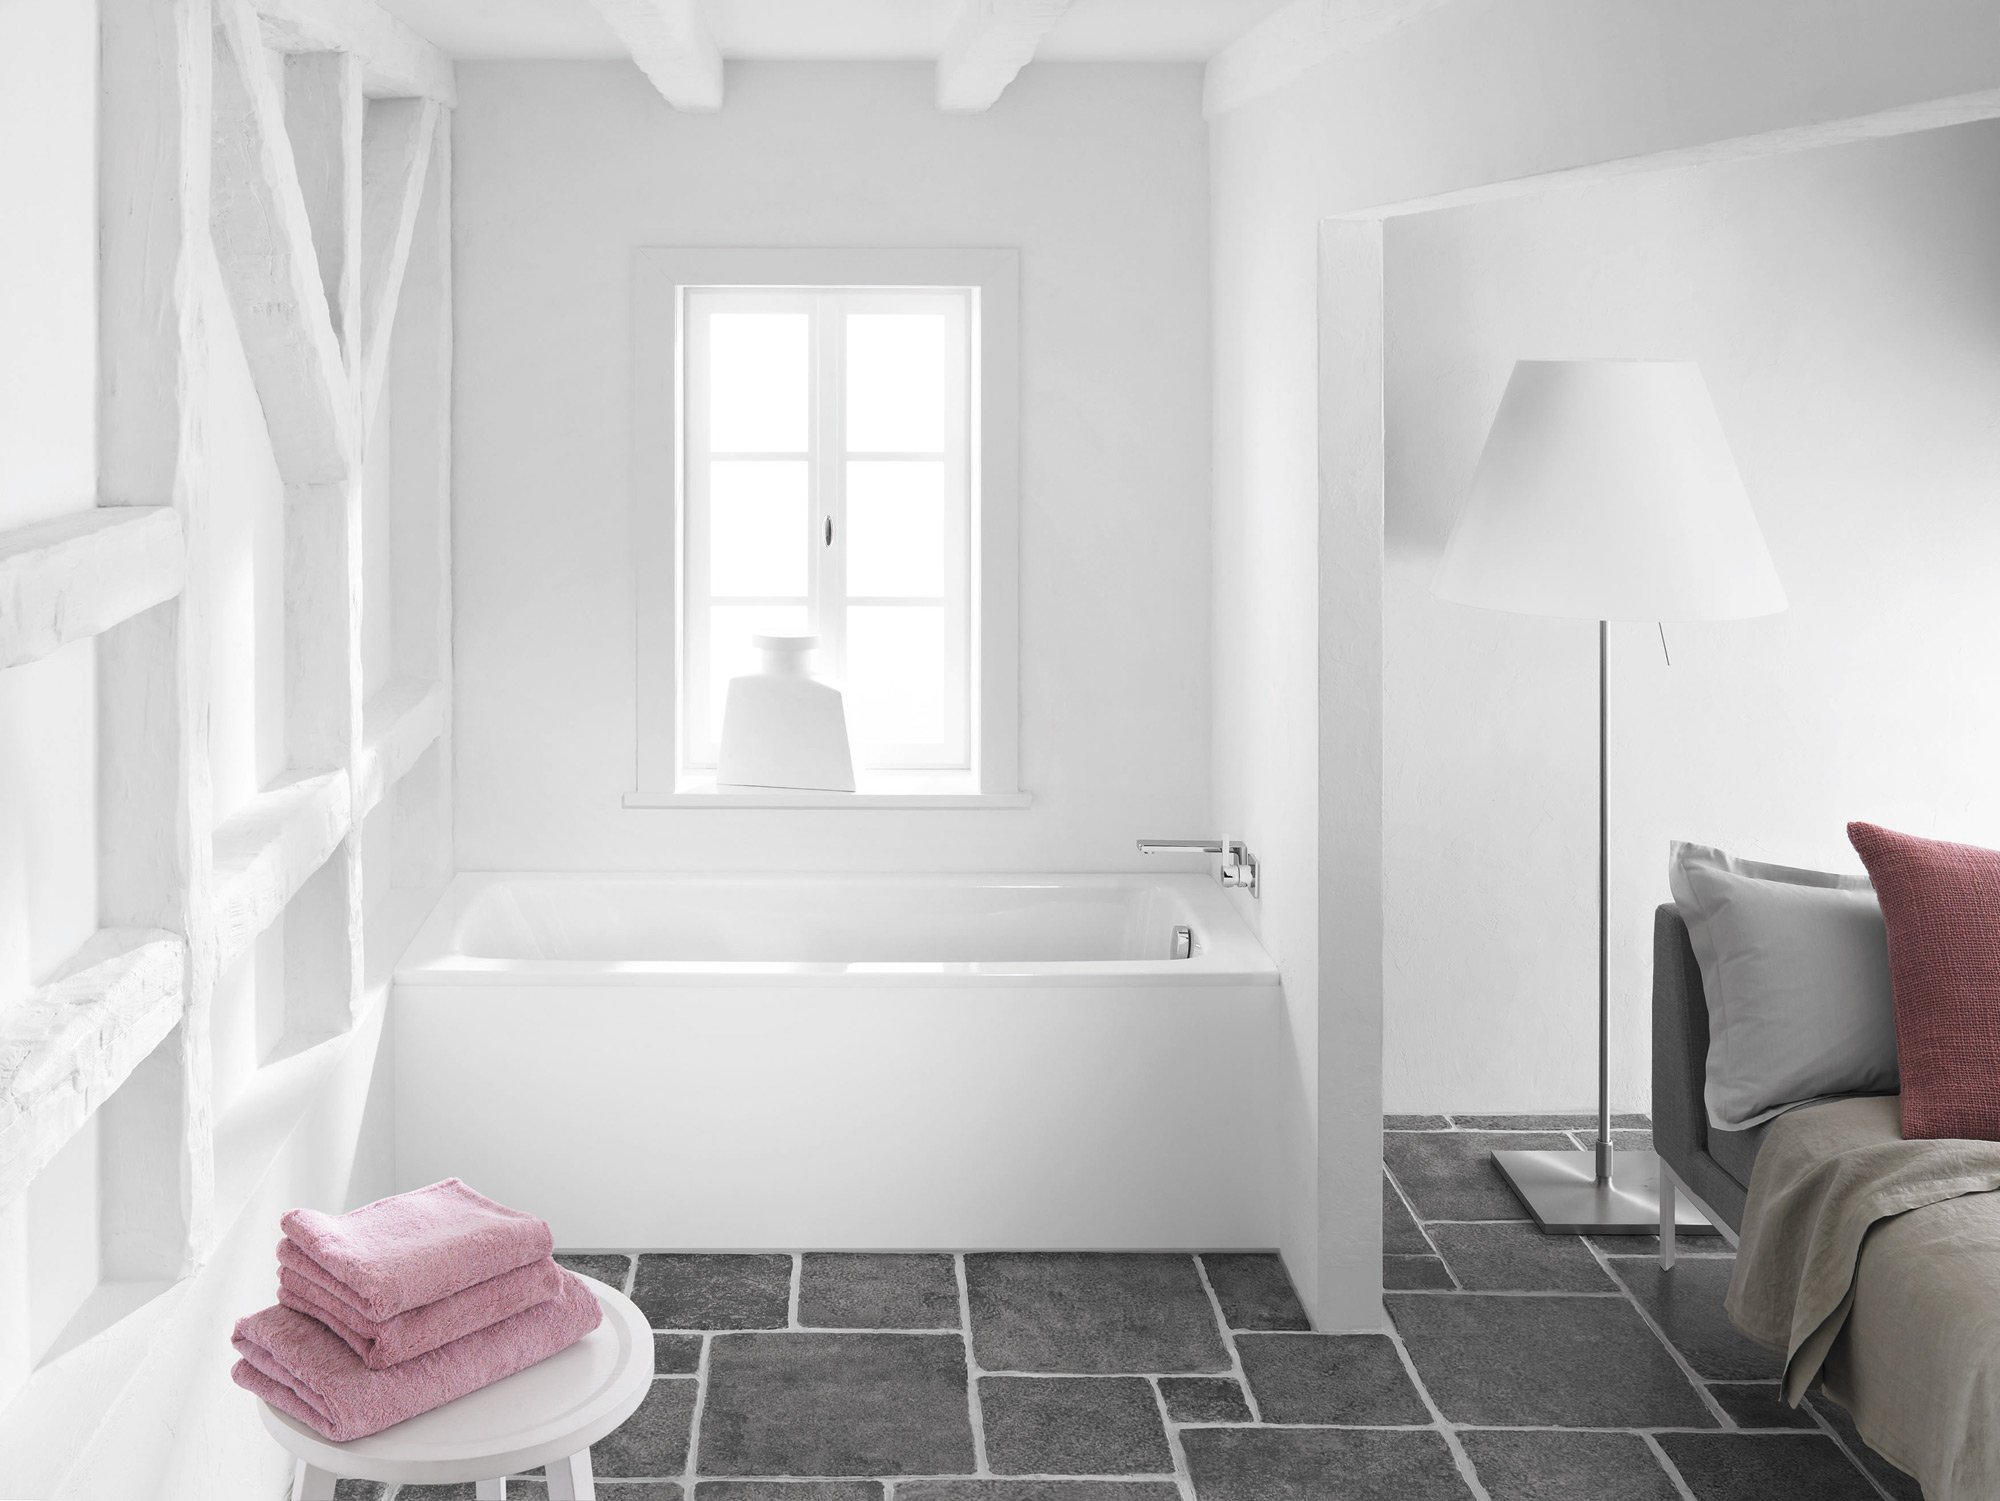 15 vasche da bagno piccole foto living corriere - Vasche da bagno kaldewei ...